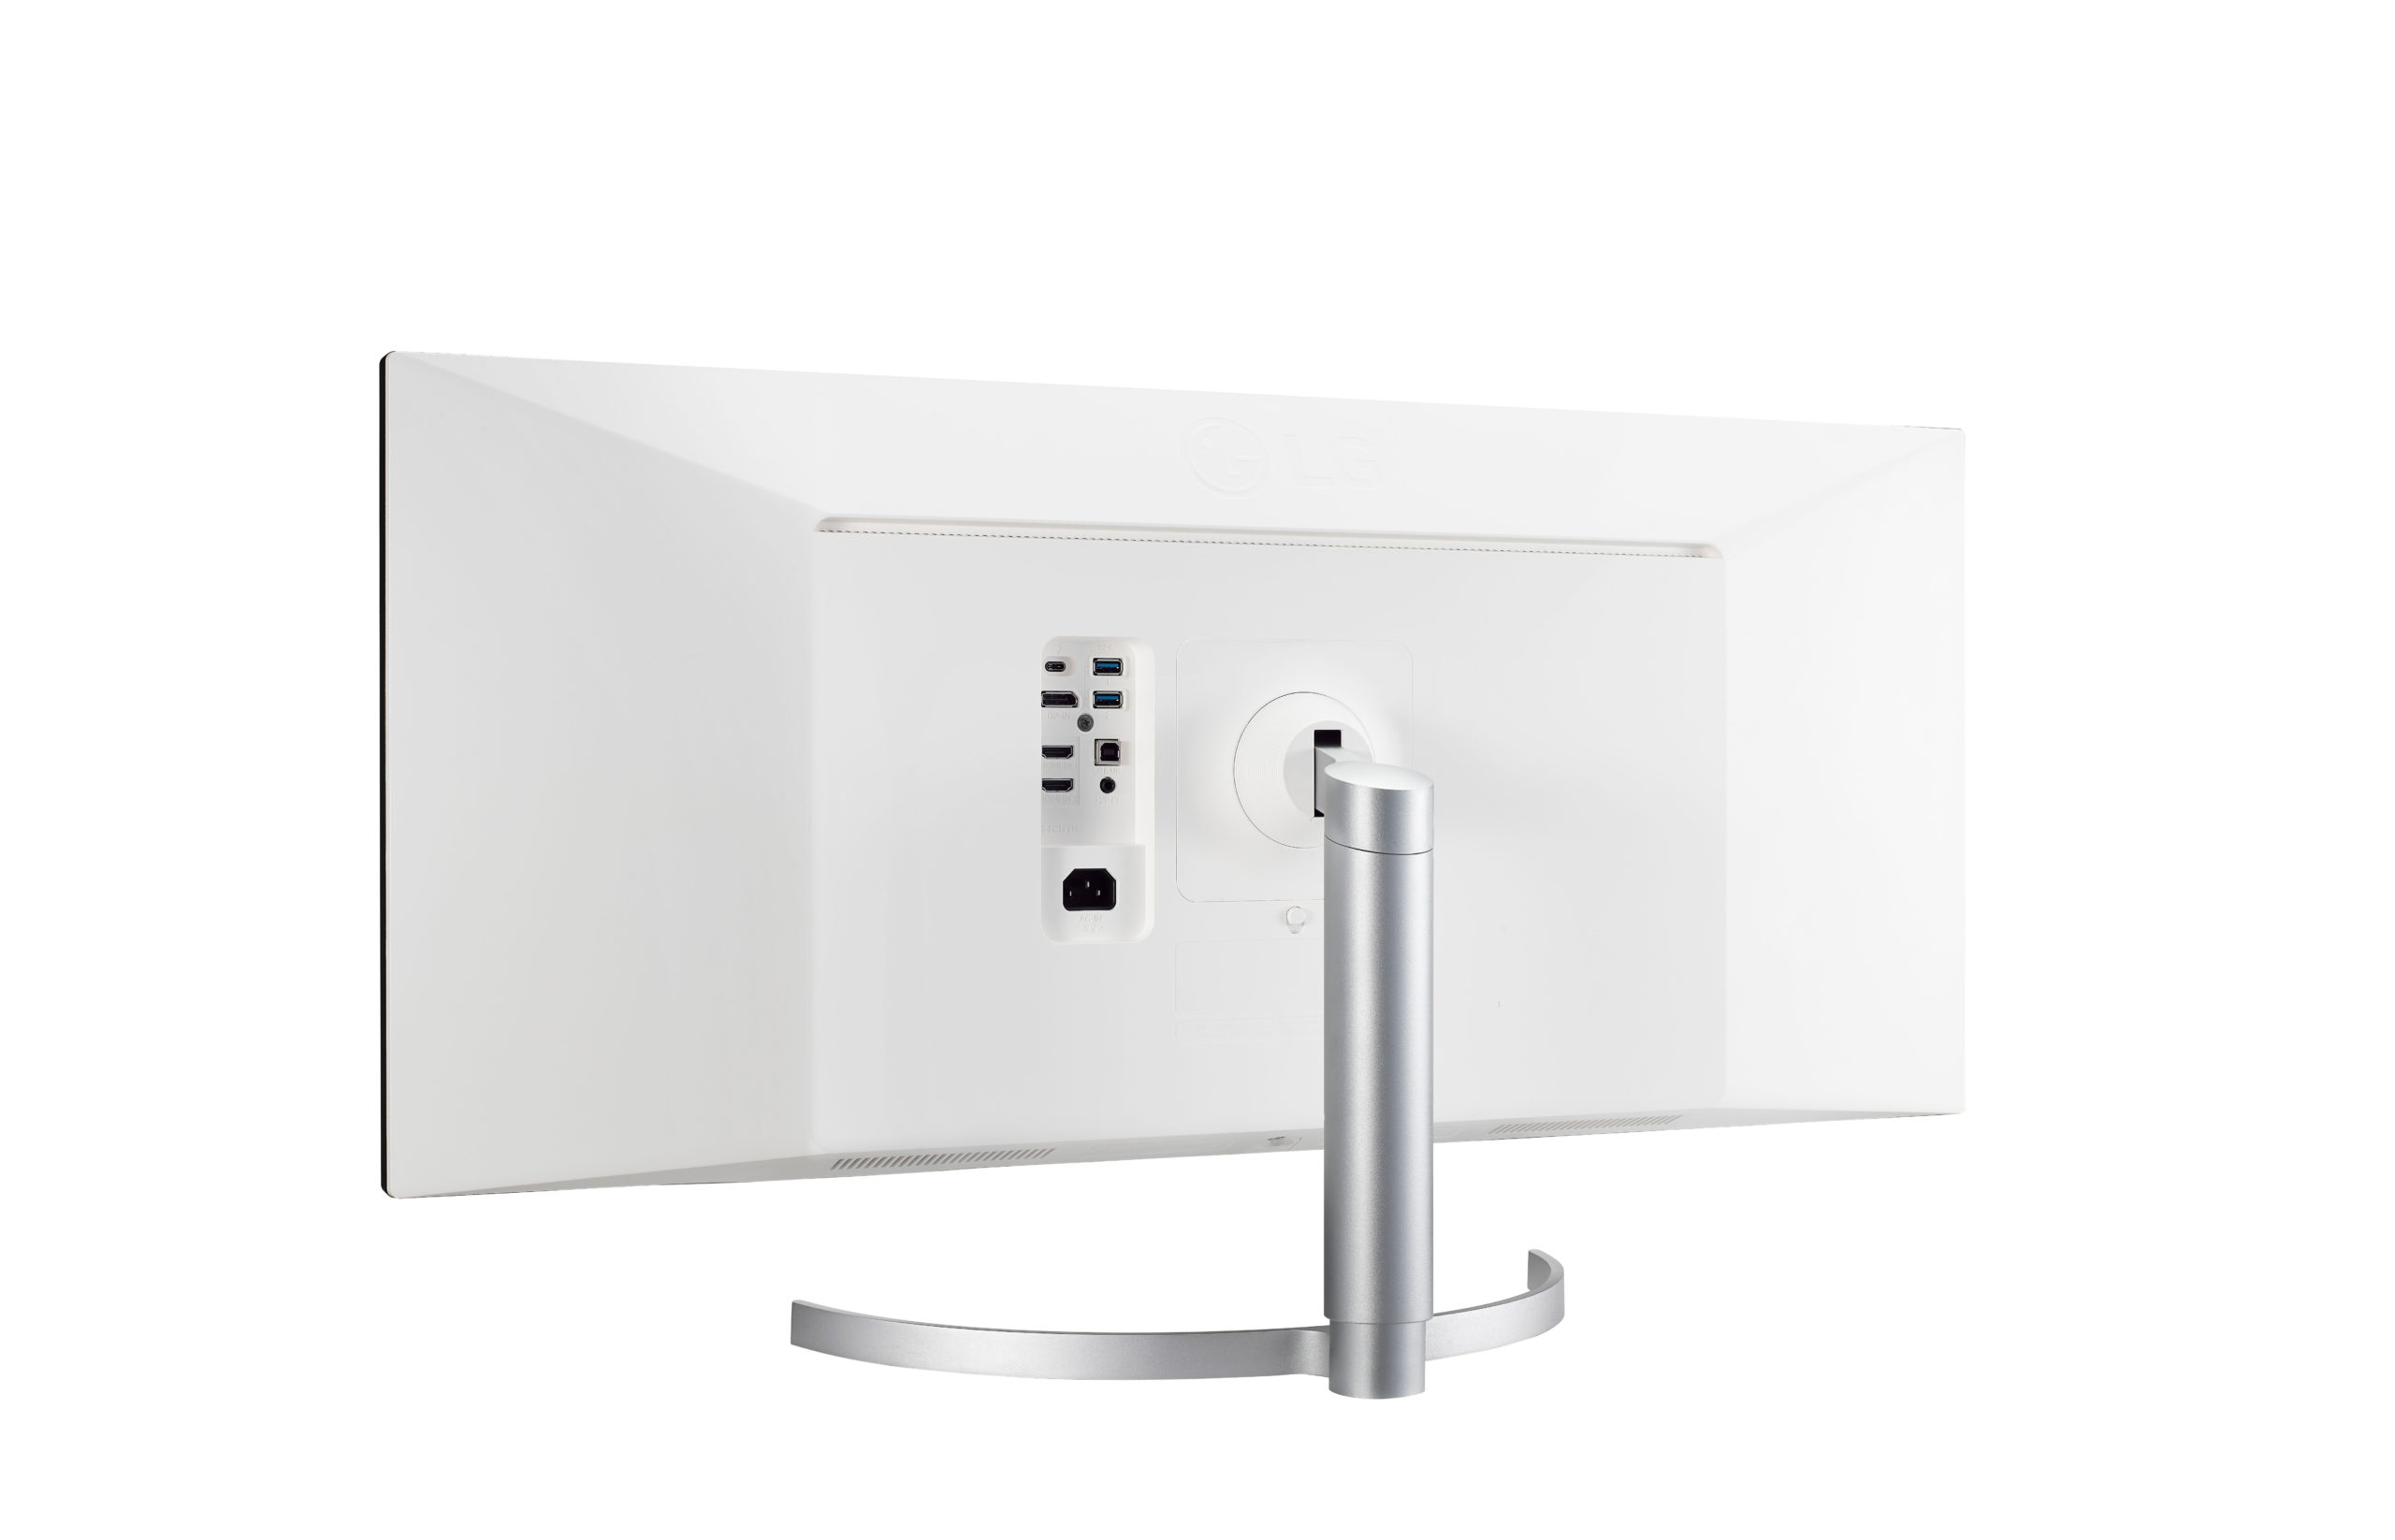 Review: LG 5K 34WK95U-W UltraWide Monitor